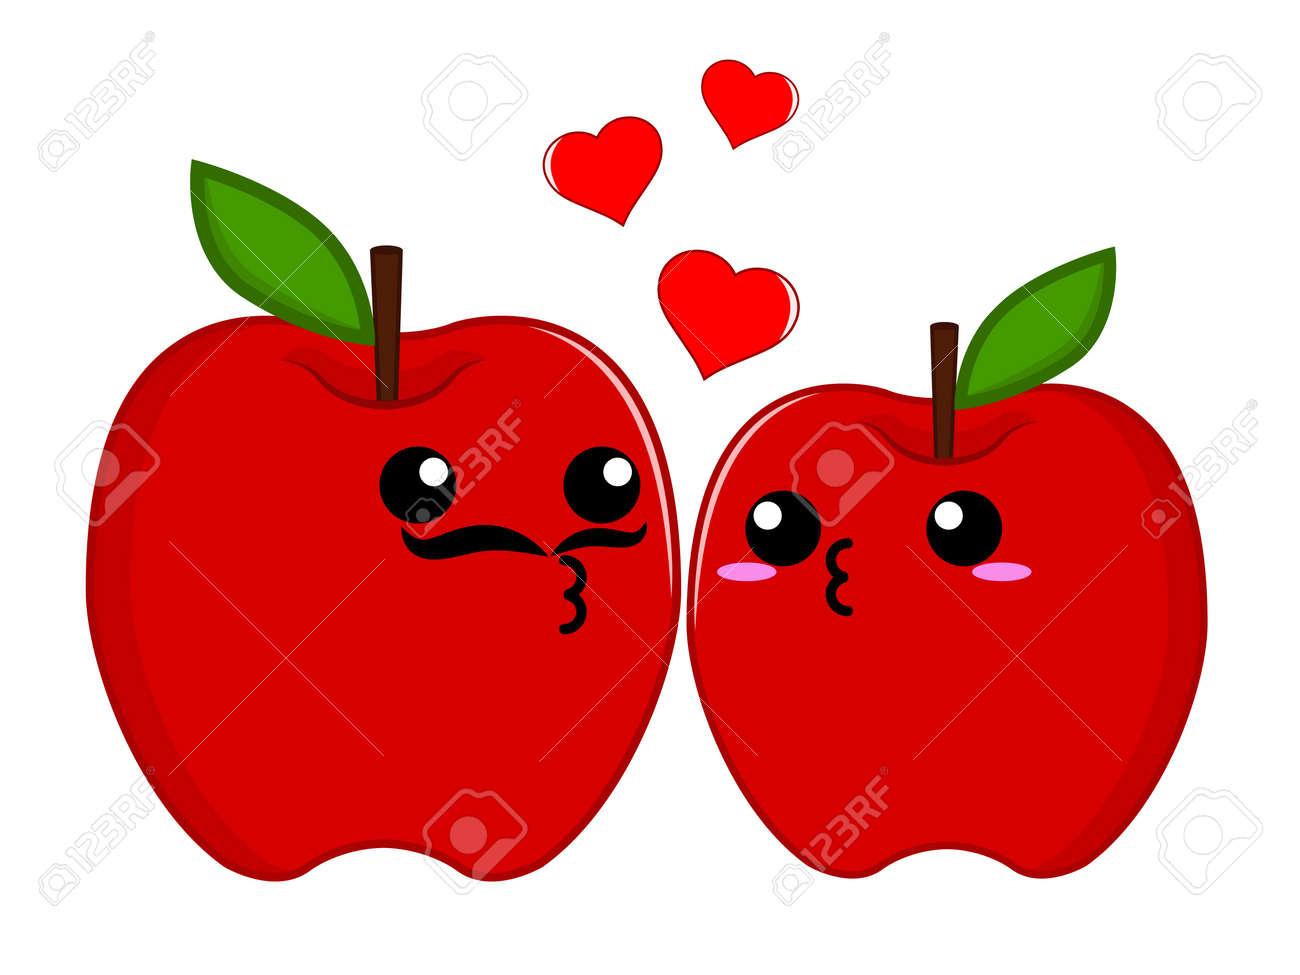 Apple Couple - 53859532